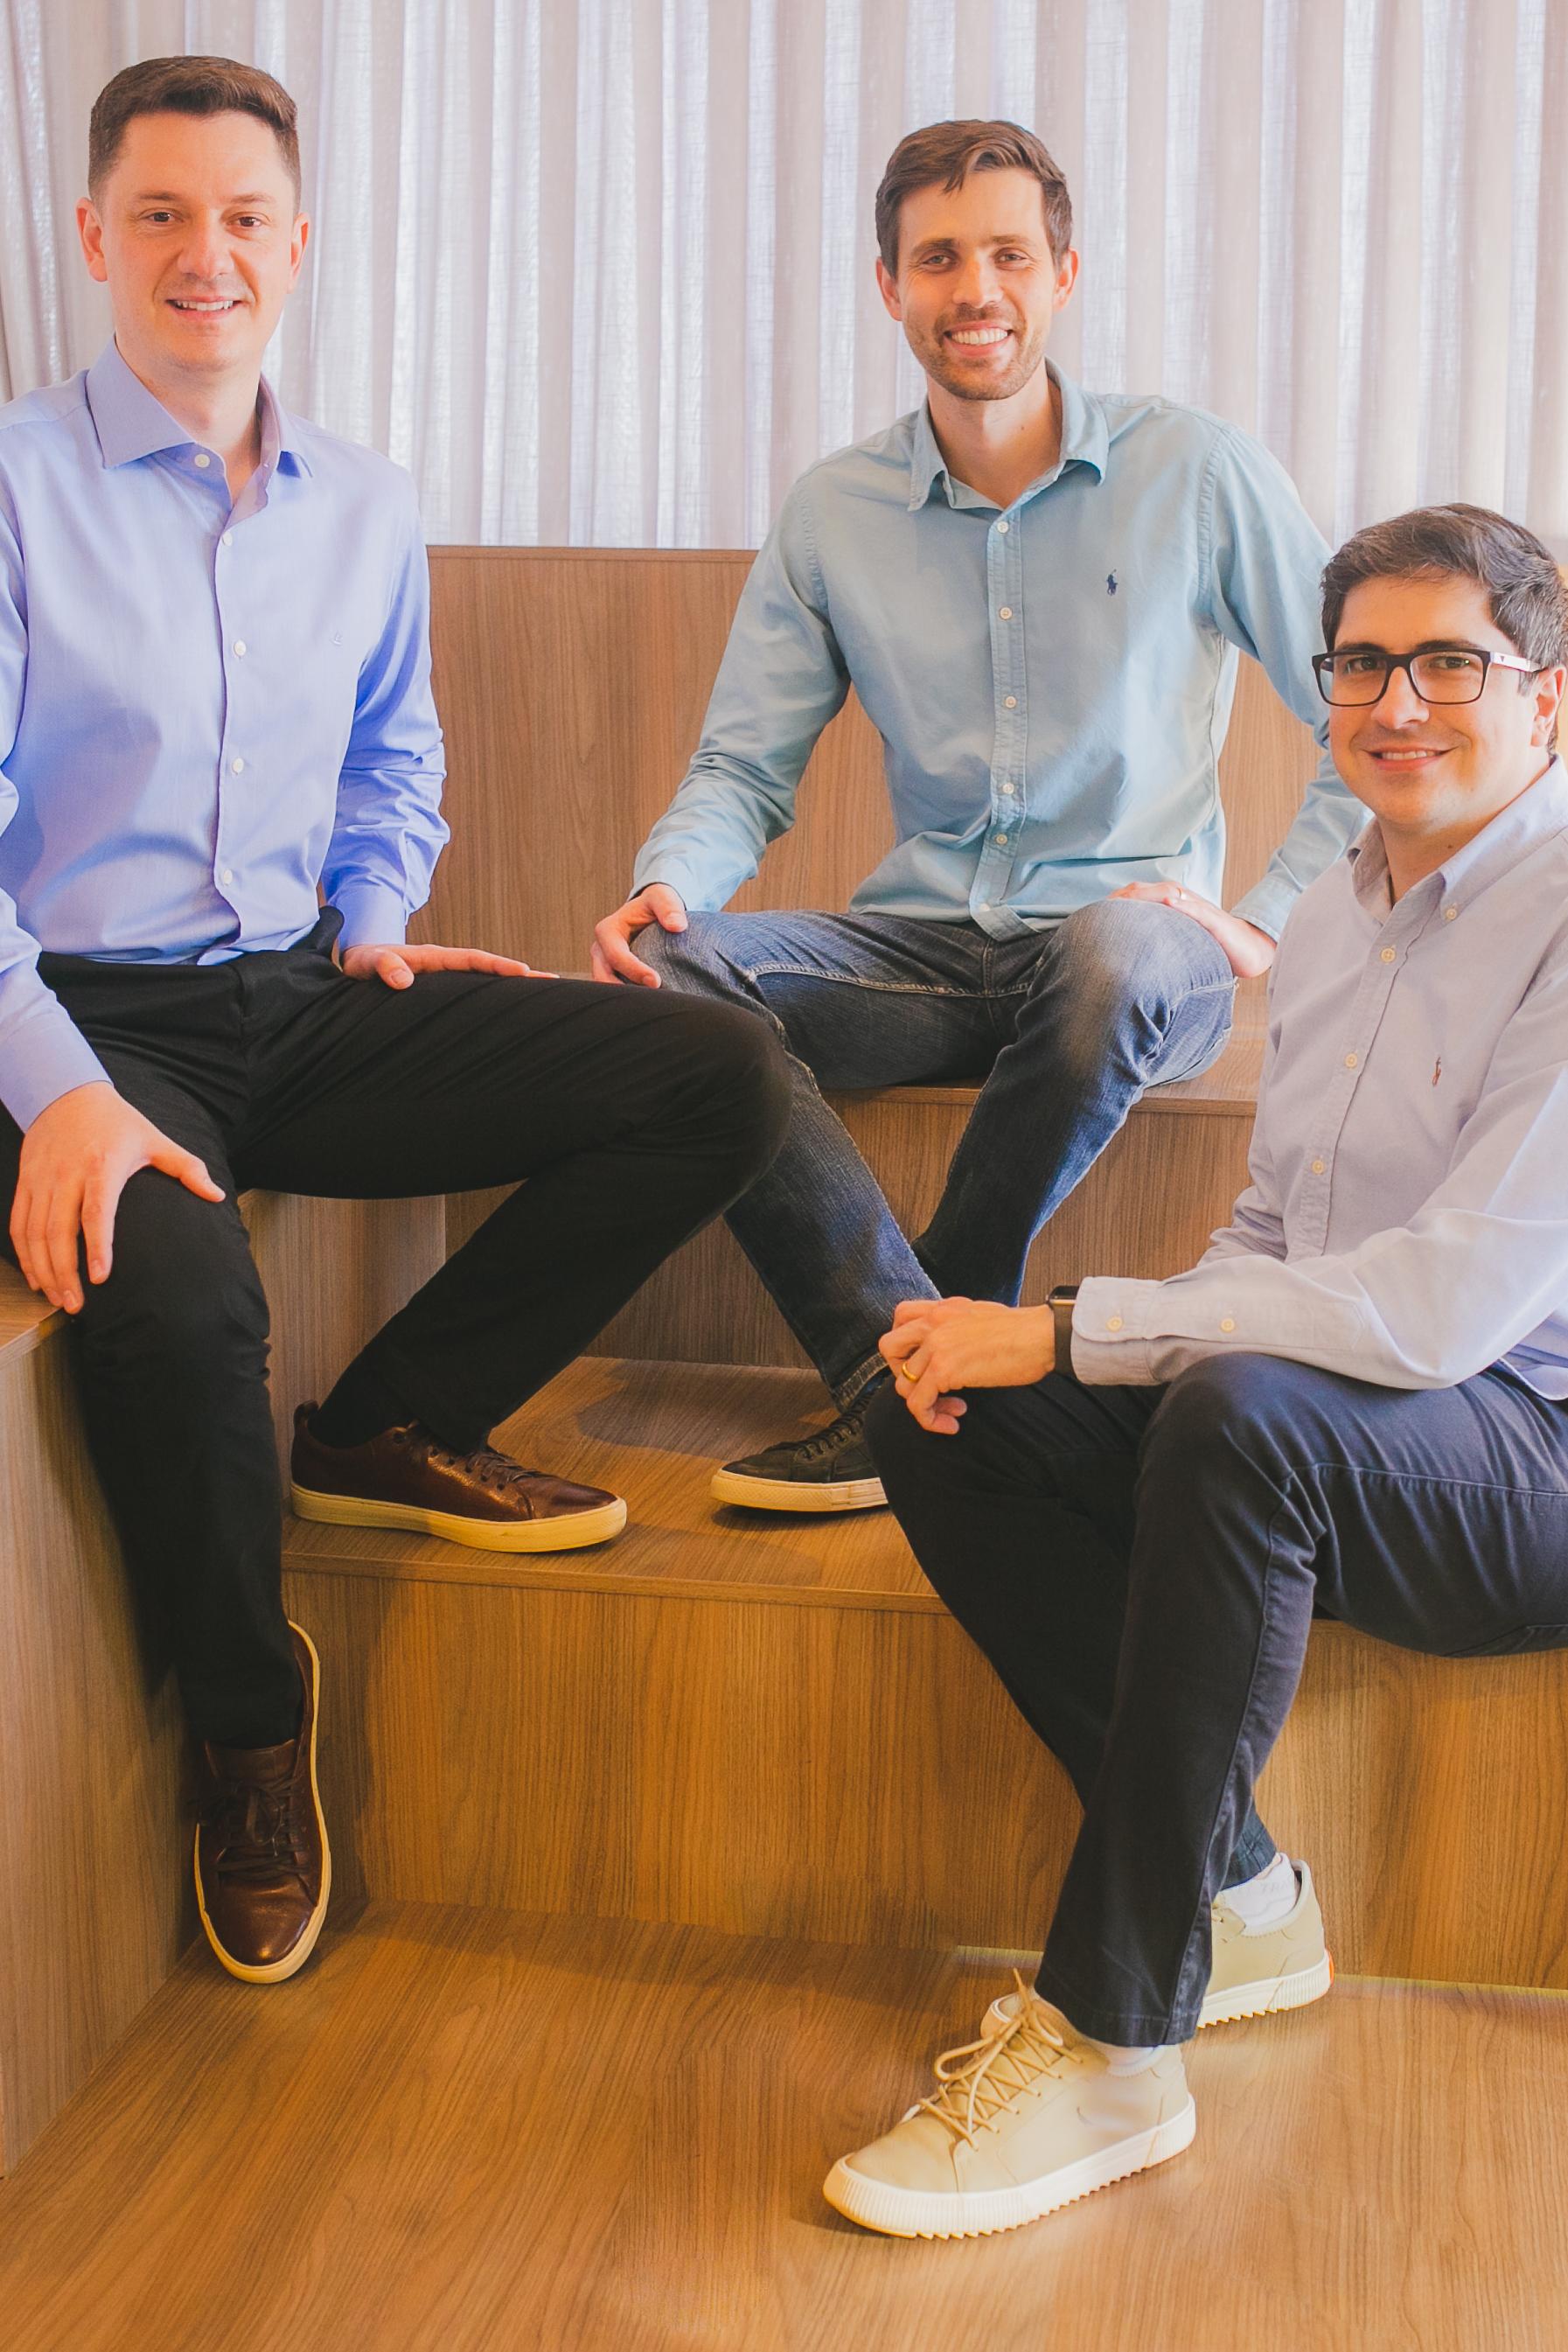 Fundadores da Mercos, da esquerda para direita: Rafael Trapp, Tiago Brandes e Celso Tonelli. Foto: Leonardo Waltrick